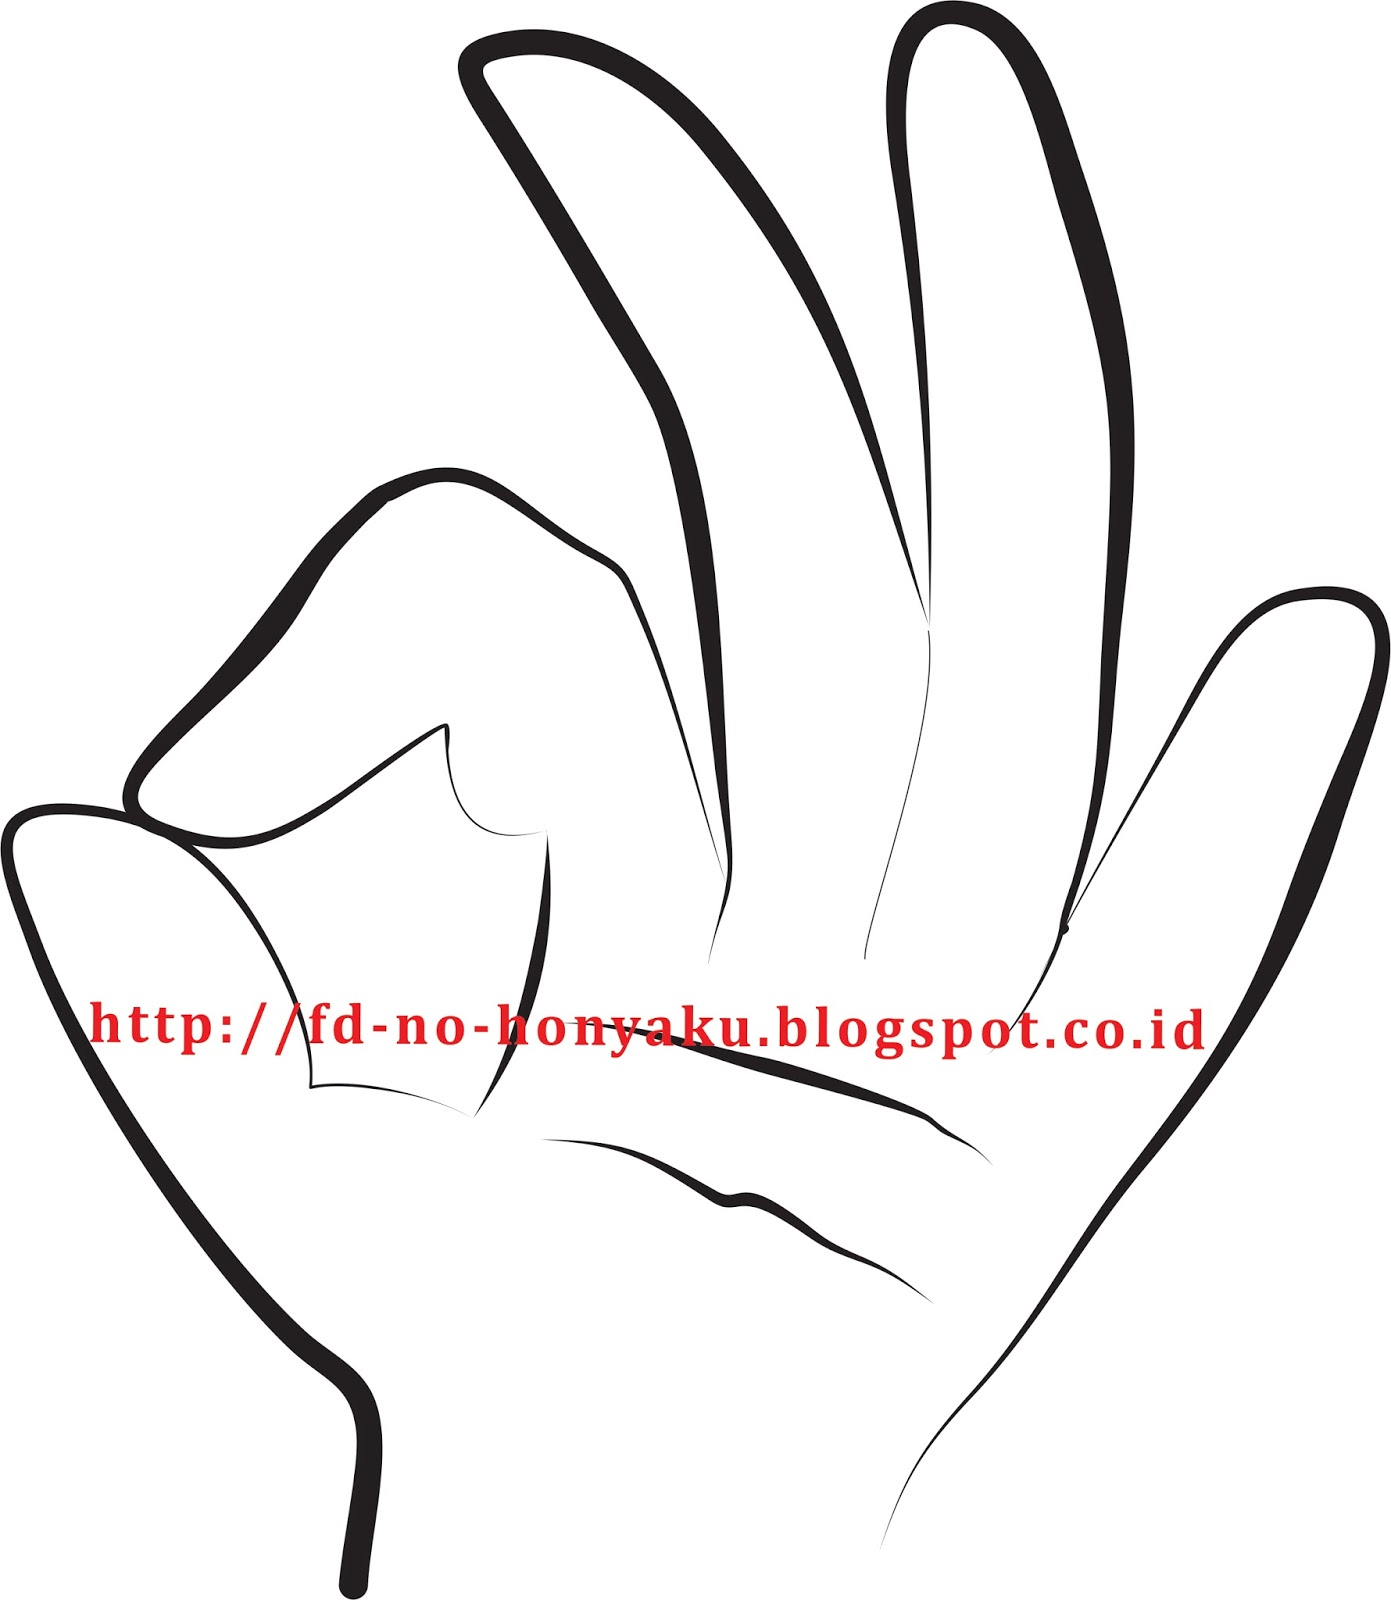 Bagi orang Indonesia bentuk ini bermakna oke atau tanda kesiapan sedangkan tiga jari yang mengarah ke atas dapat diartikan tiga atau ketiga dalam berhitung